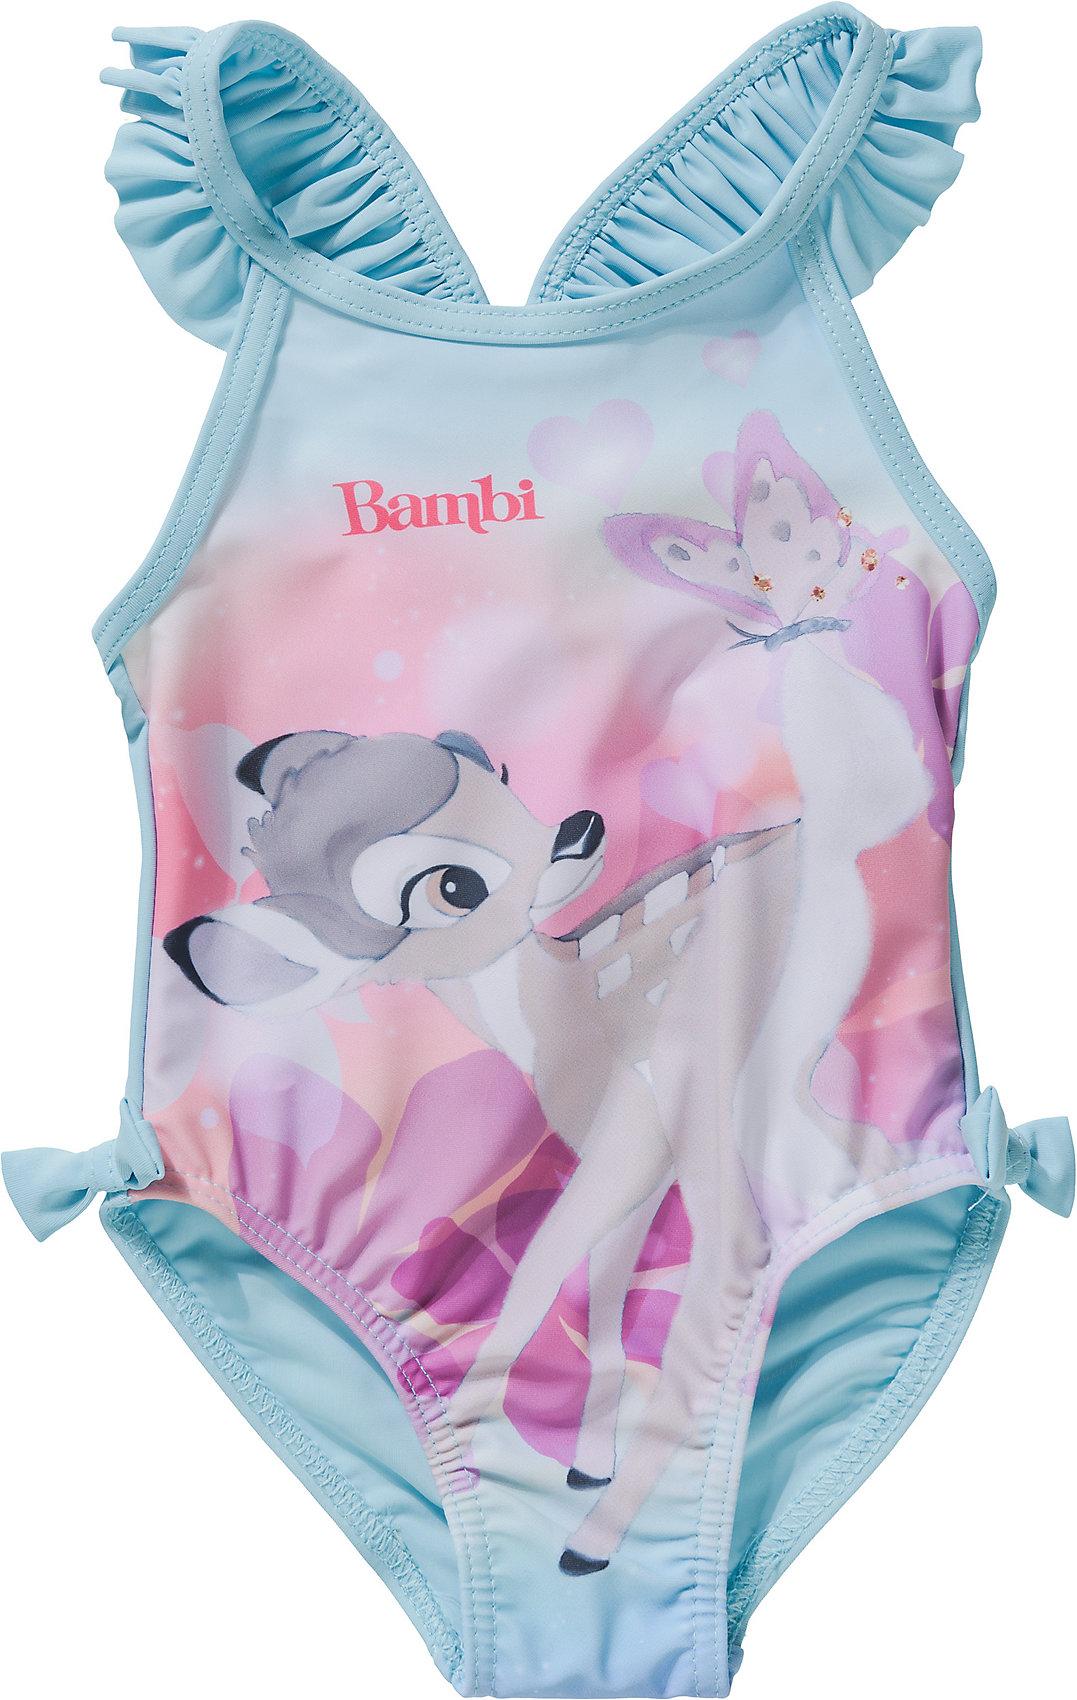 Neu Disney Bambi Baby Badeanzug 10718421 für Mädchen hellblau rosa